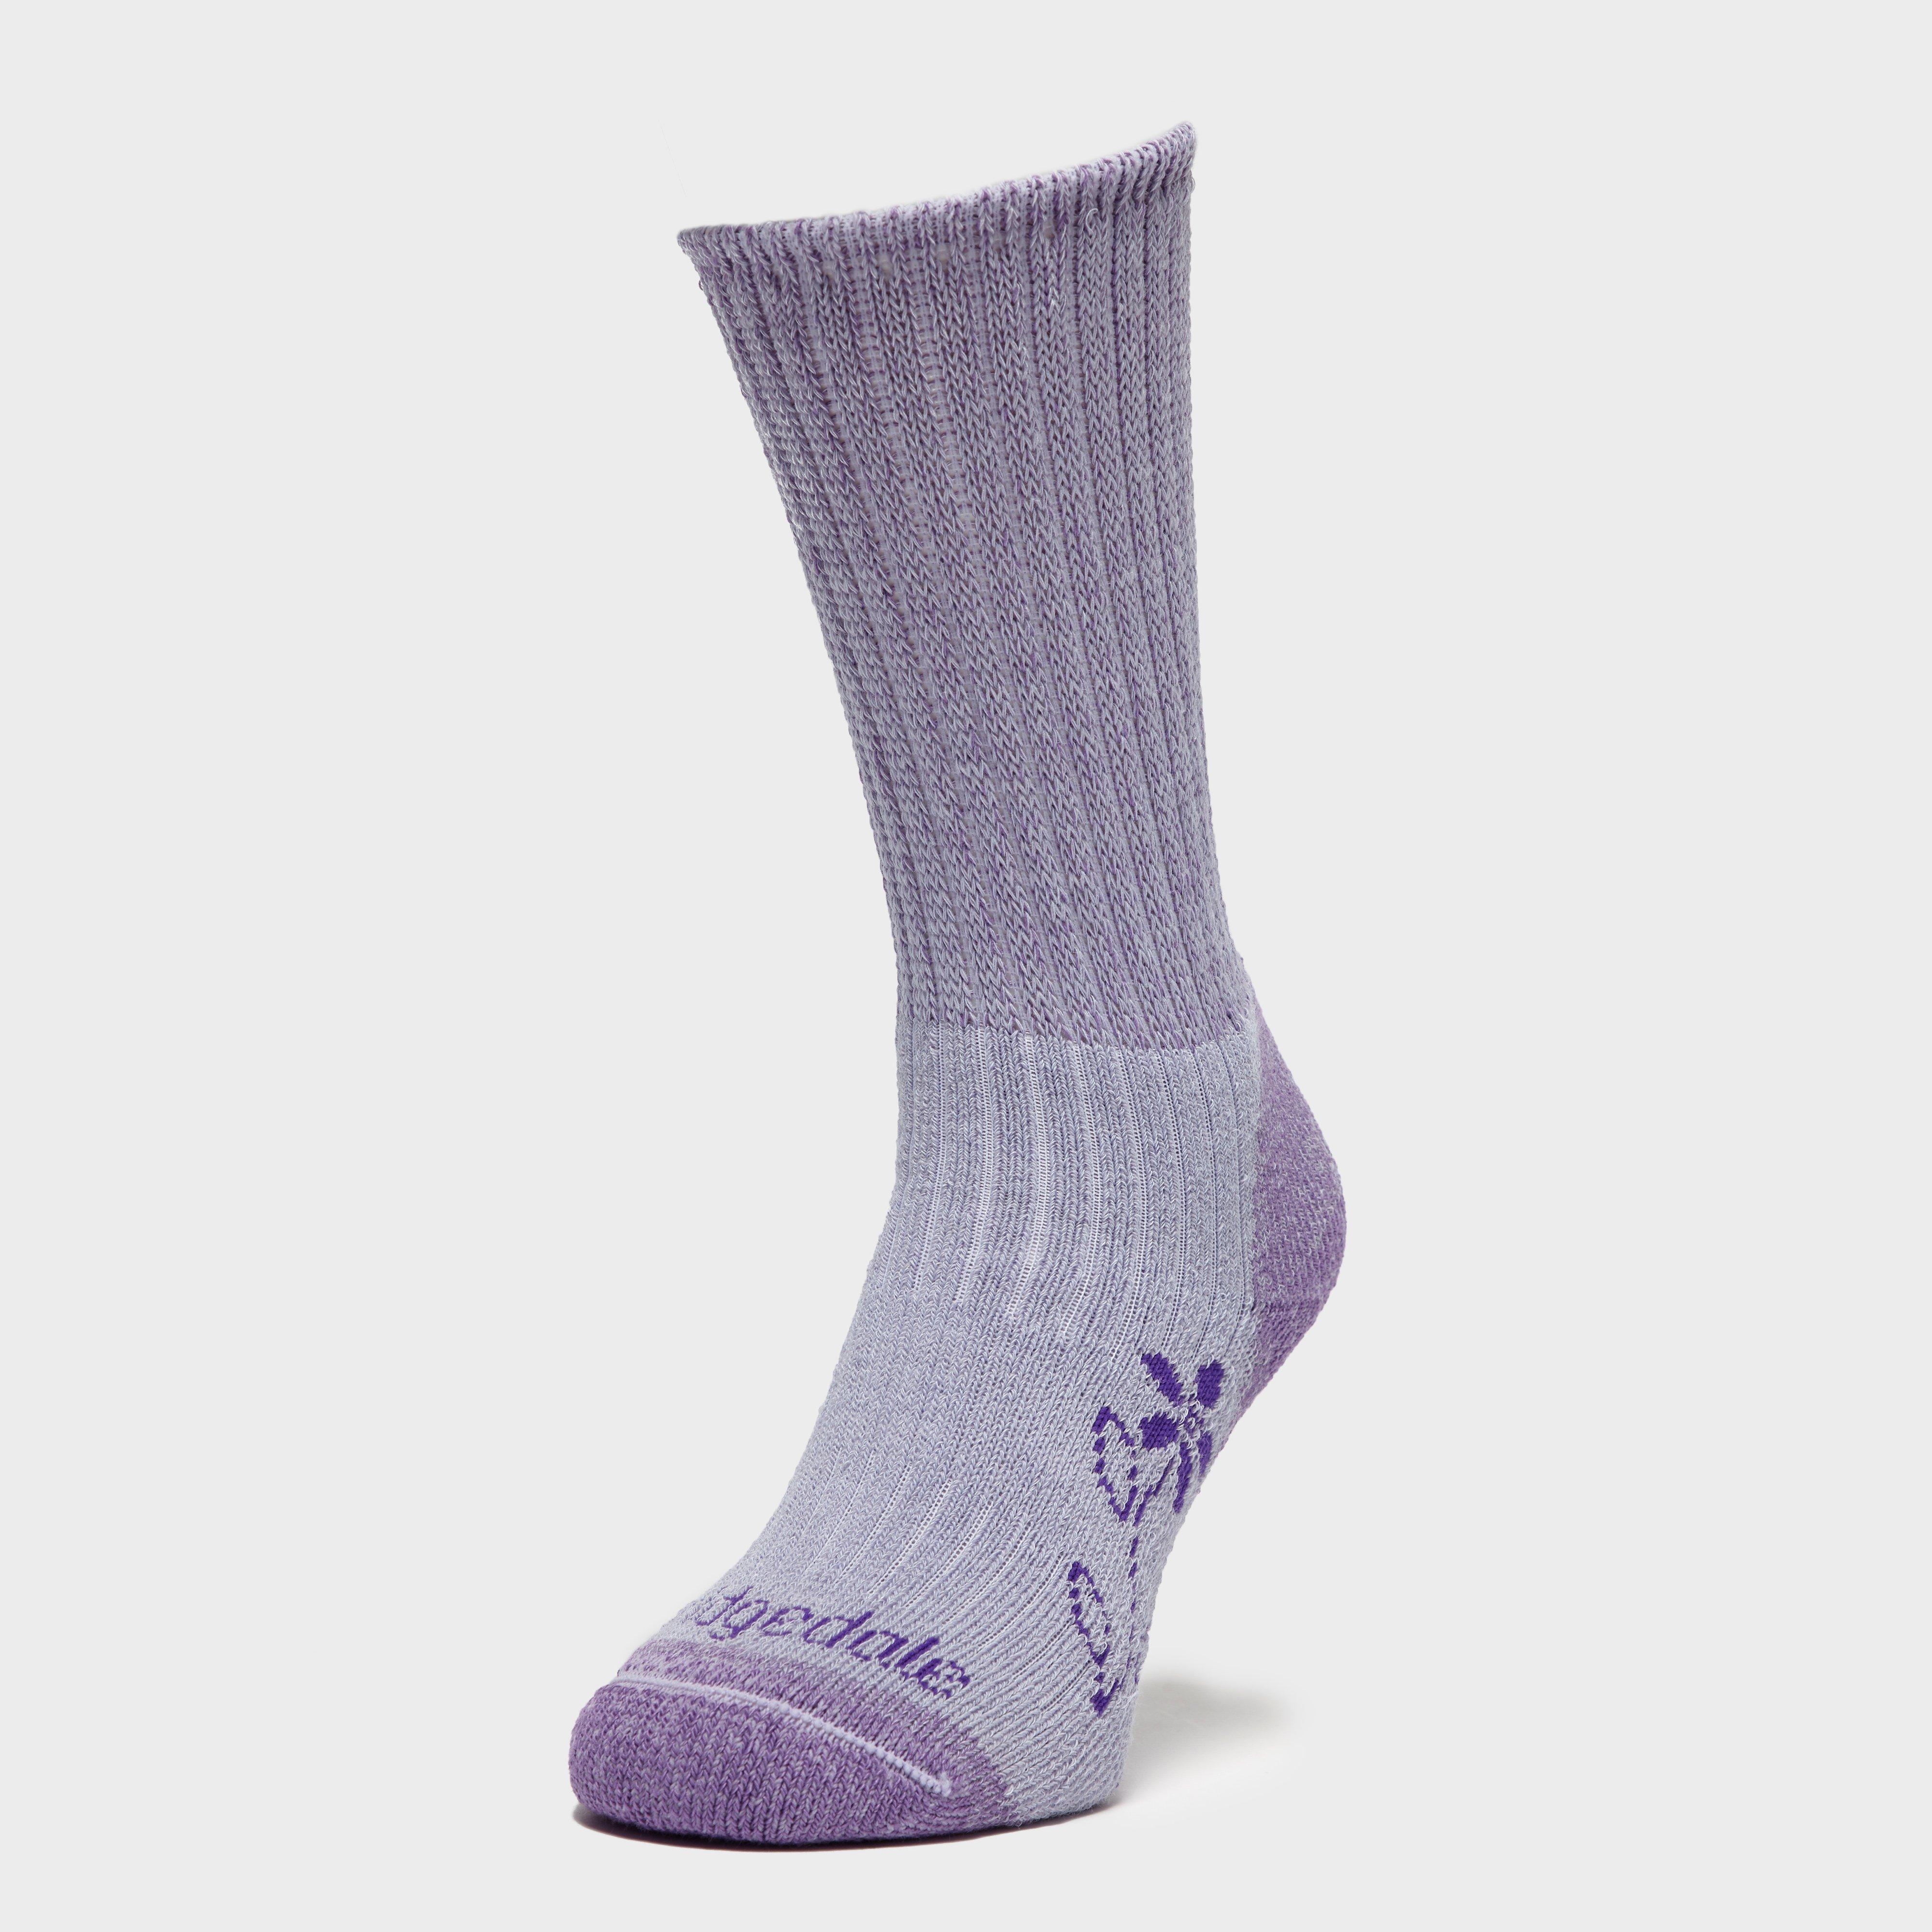 Bridgedale Bridgedale womens Hike Midweight Comfort Socks - Purple, Purple